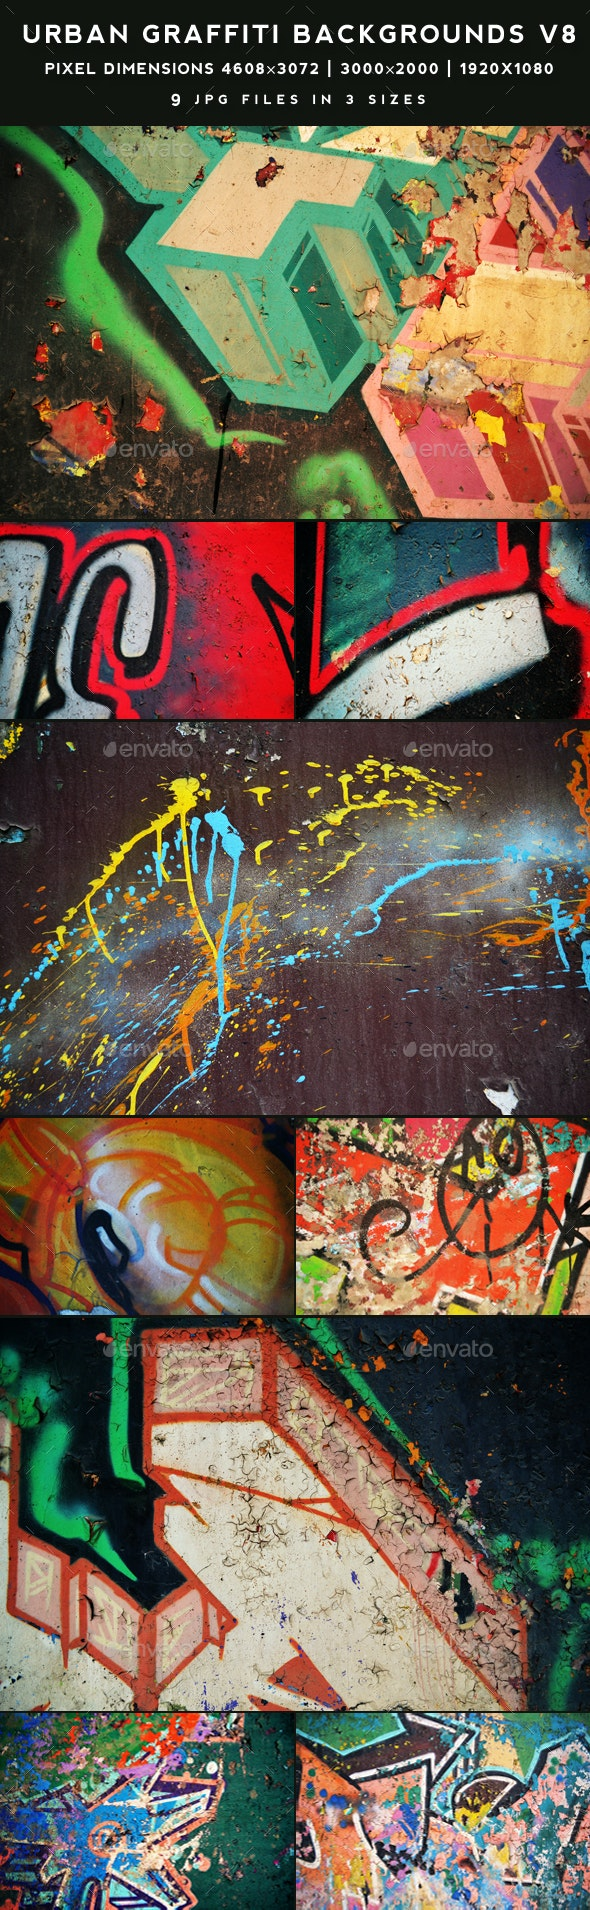 Urban Graffiti Backgrounds v8 - Urban Backgrounds